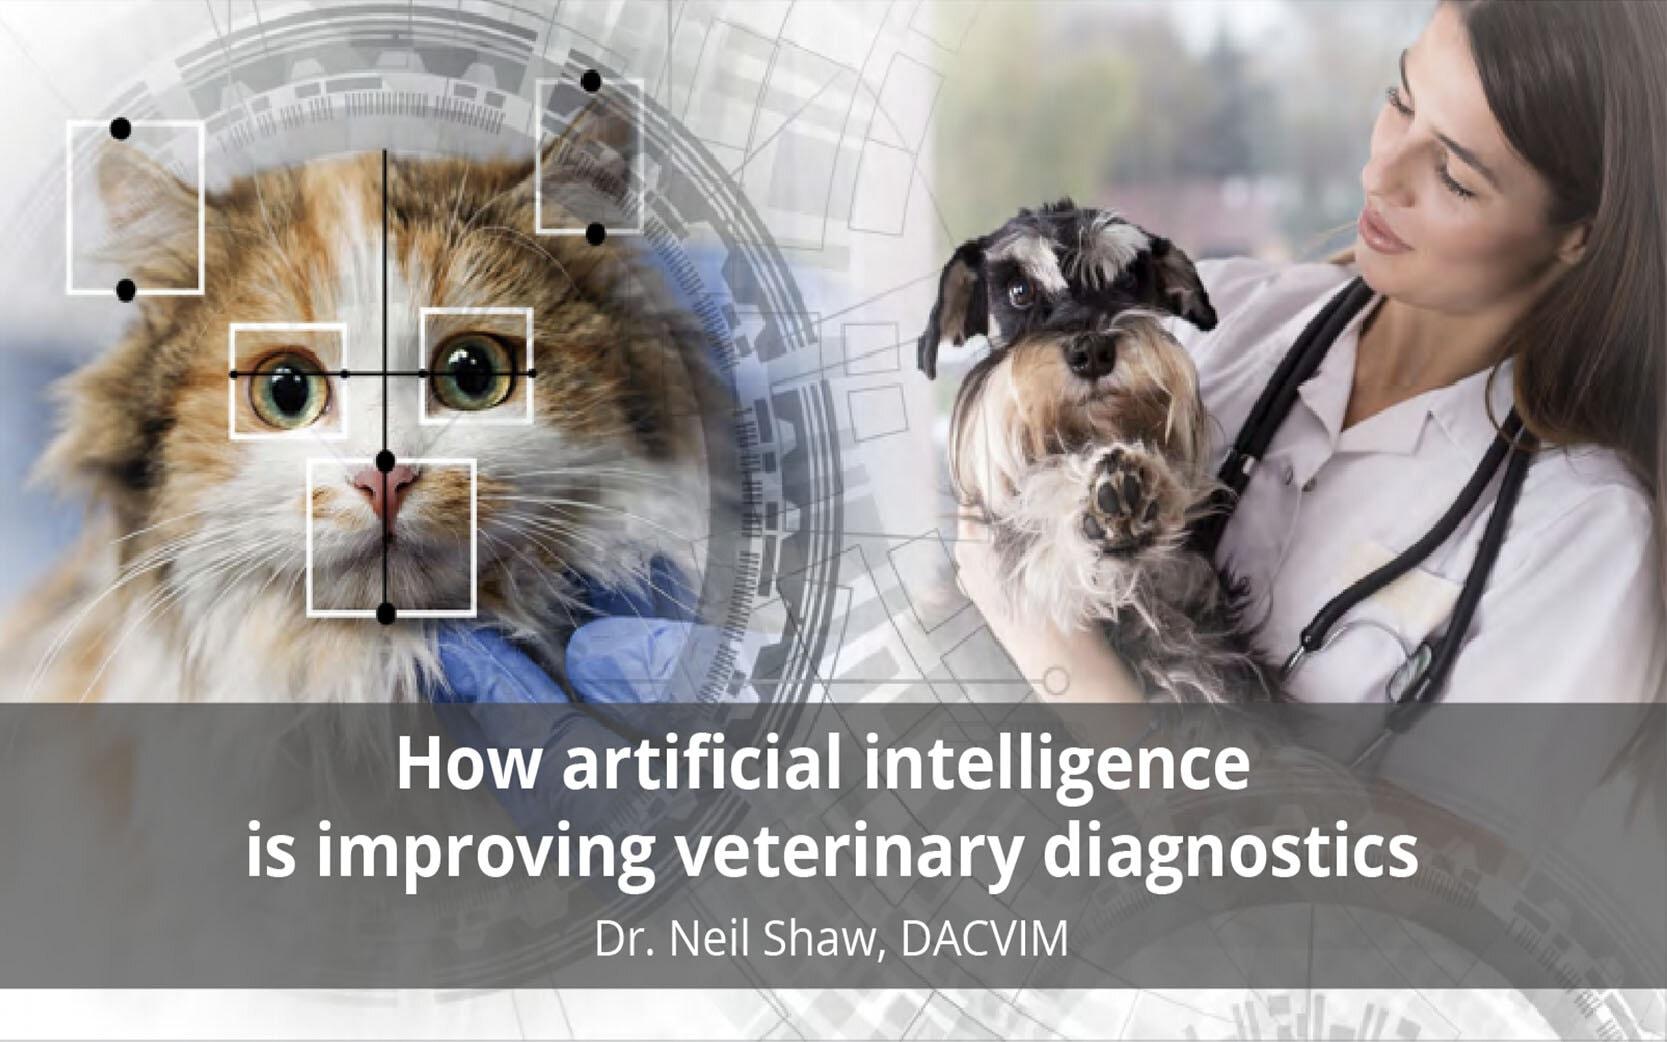 improving-veterinary-diagnostics